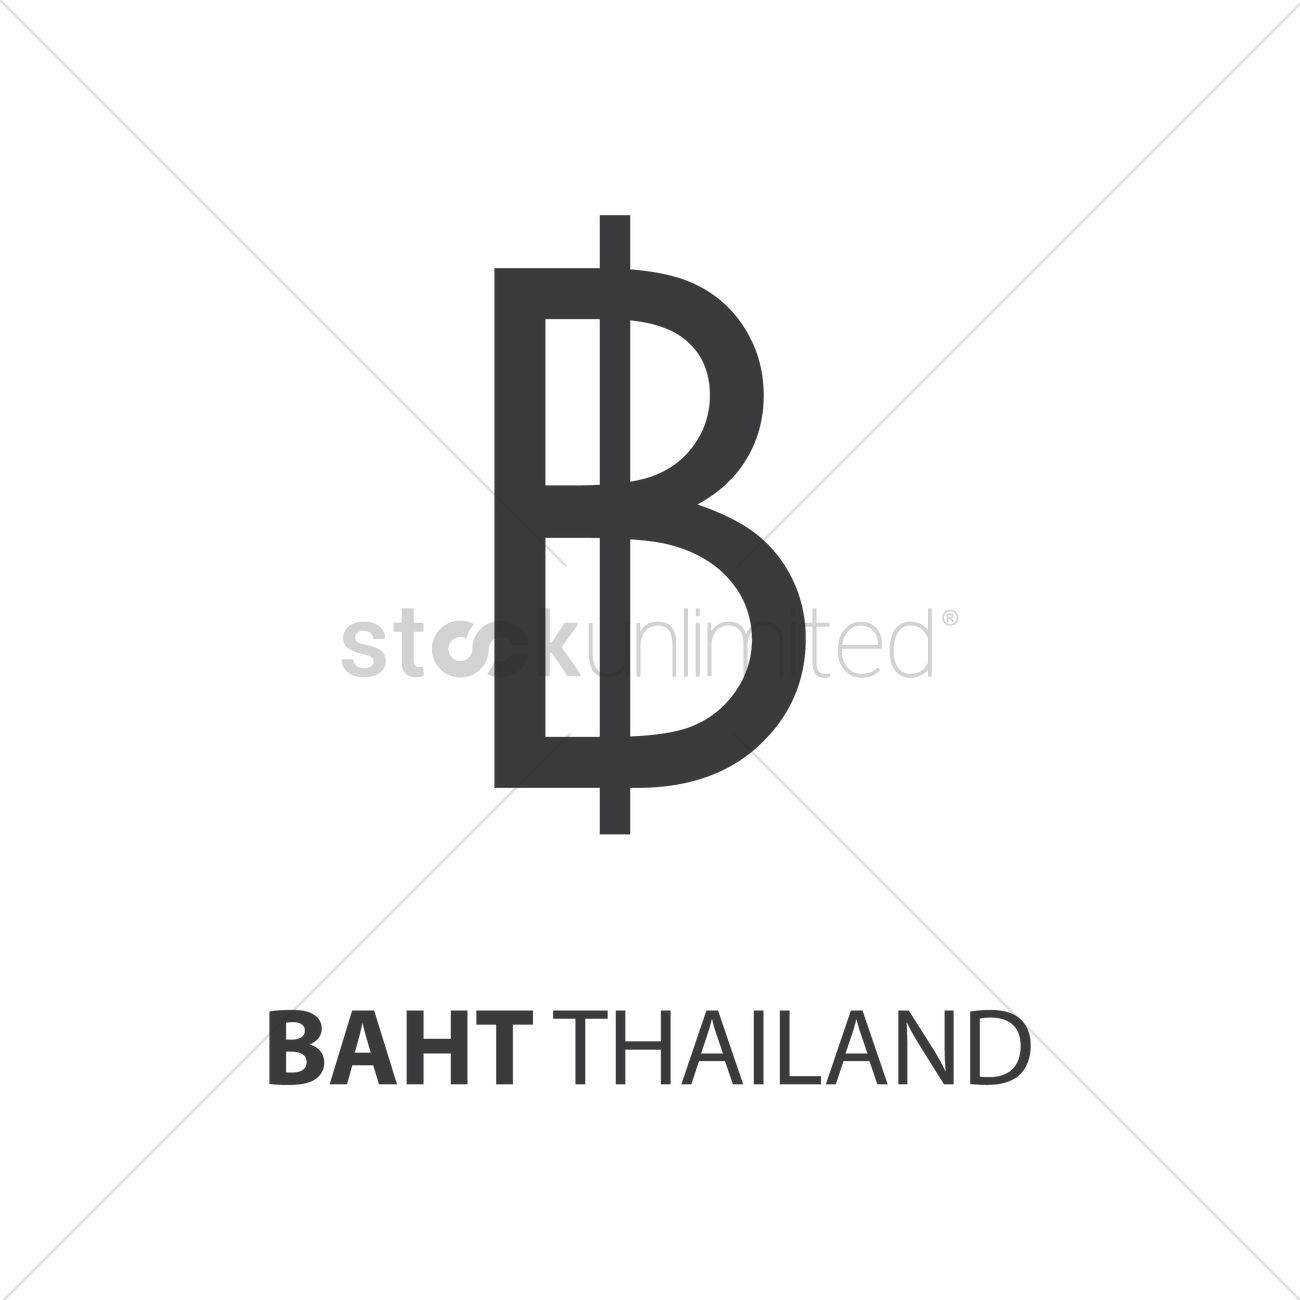 Thai Baht Vector Image 1753676 Stockunlimited